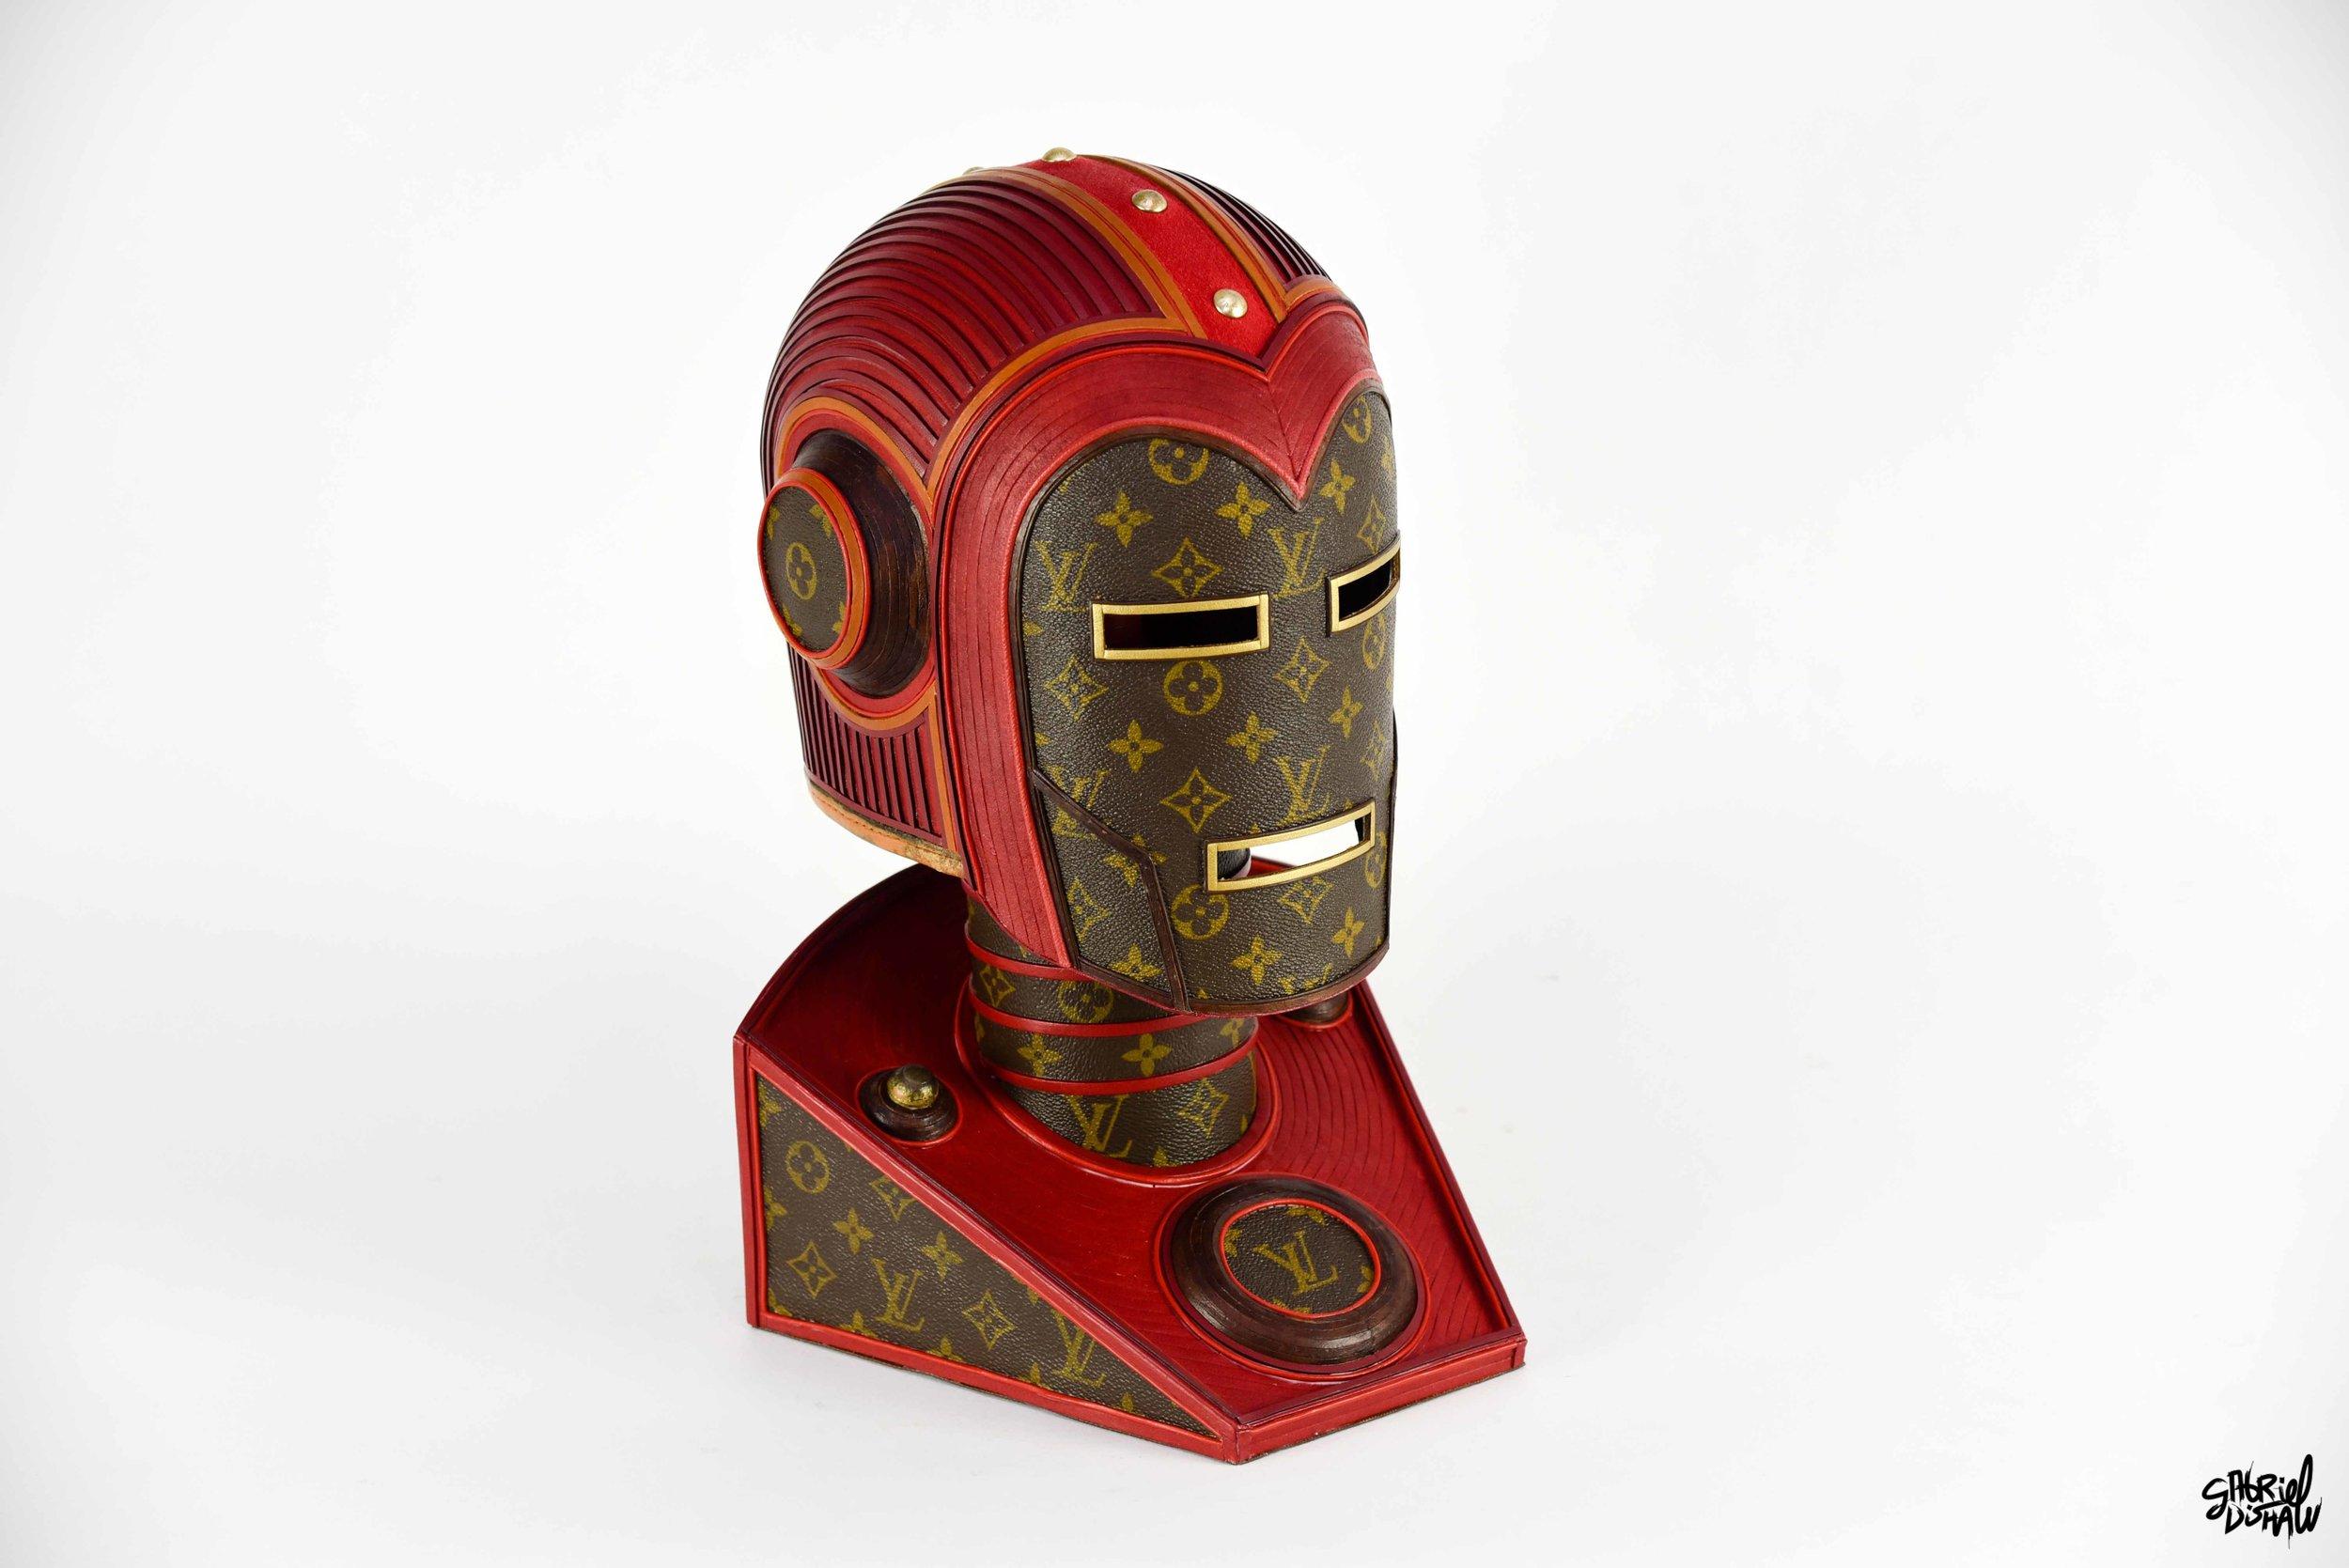 Gabriel Dishaw Vintage Iron Man LV-9953.jpg